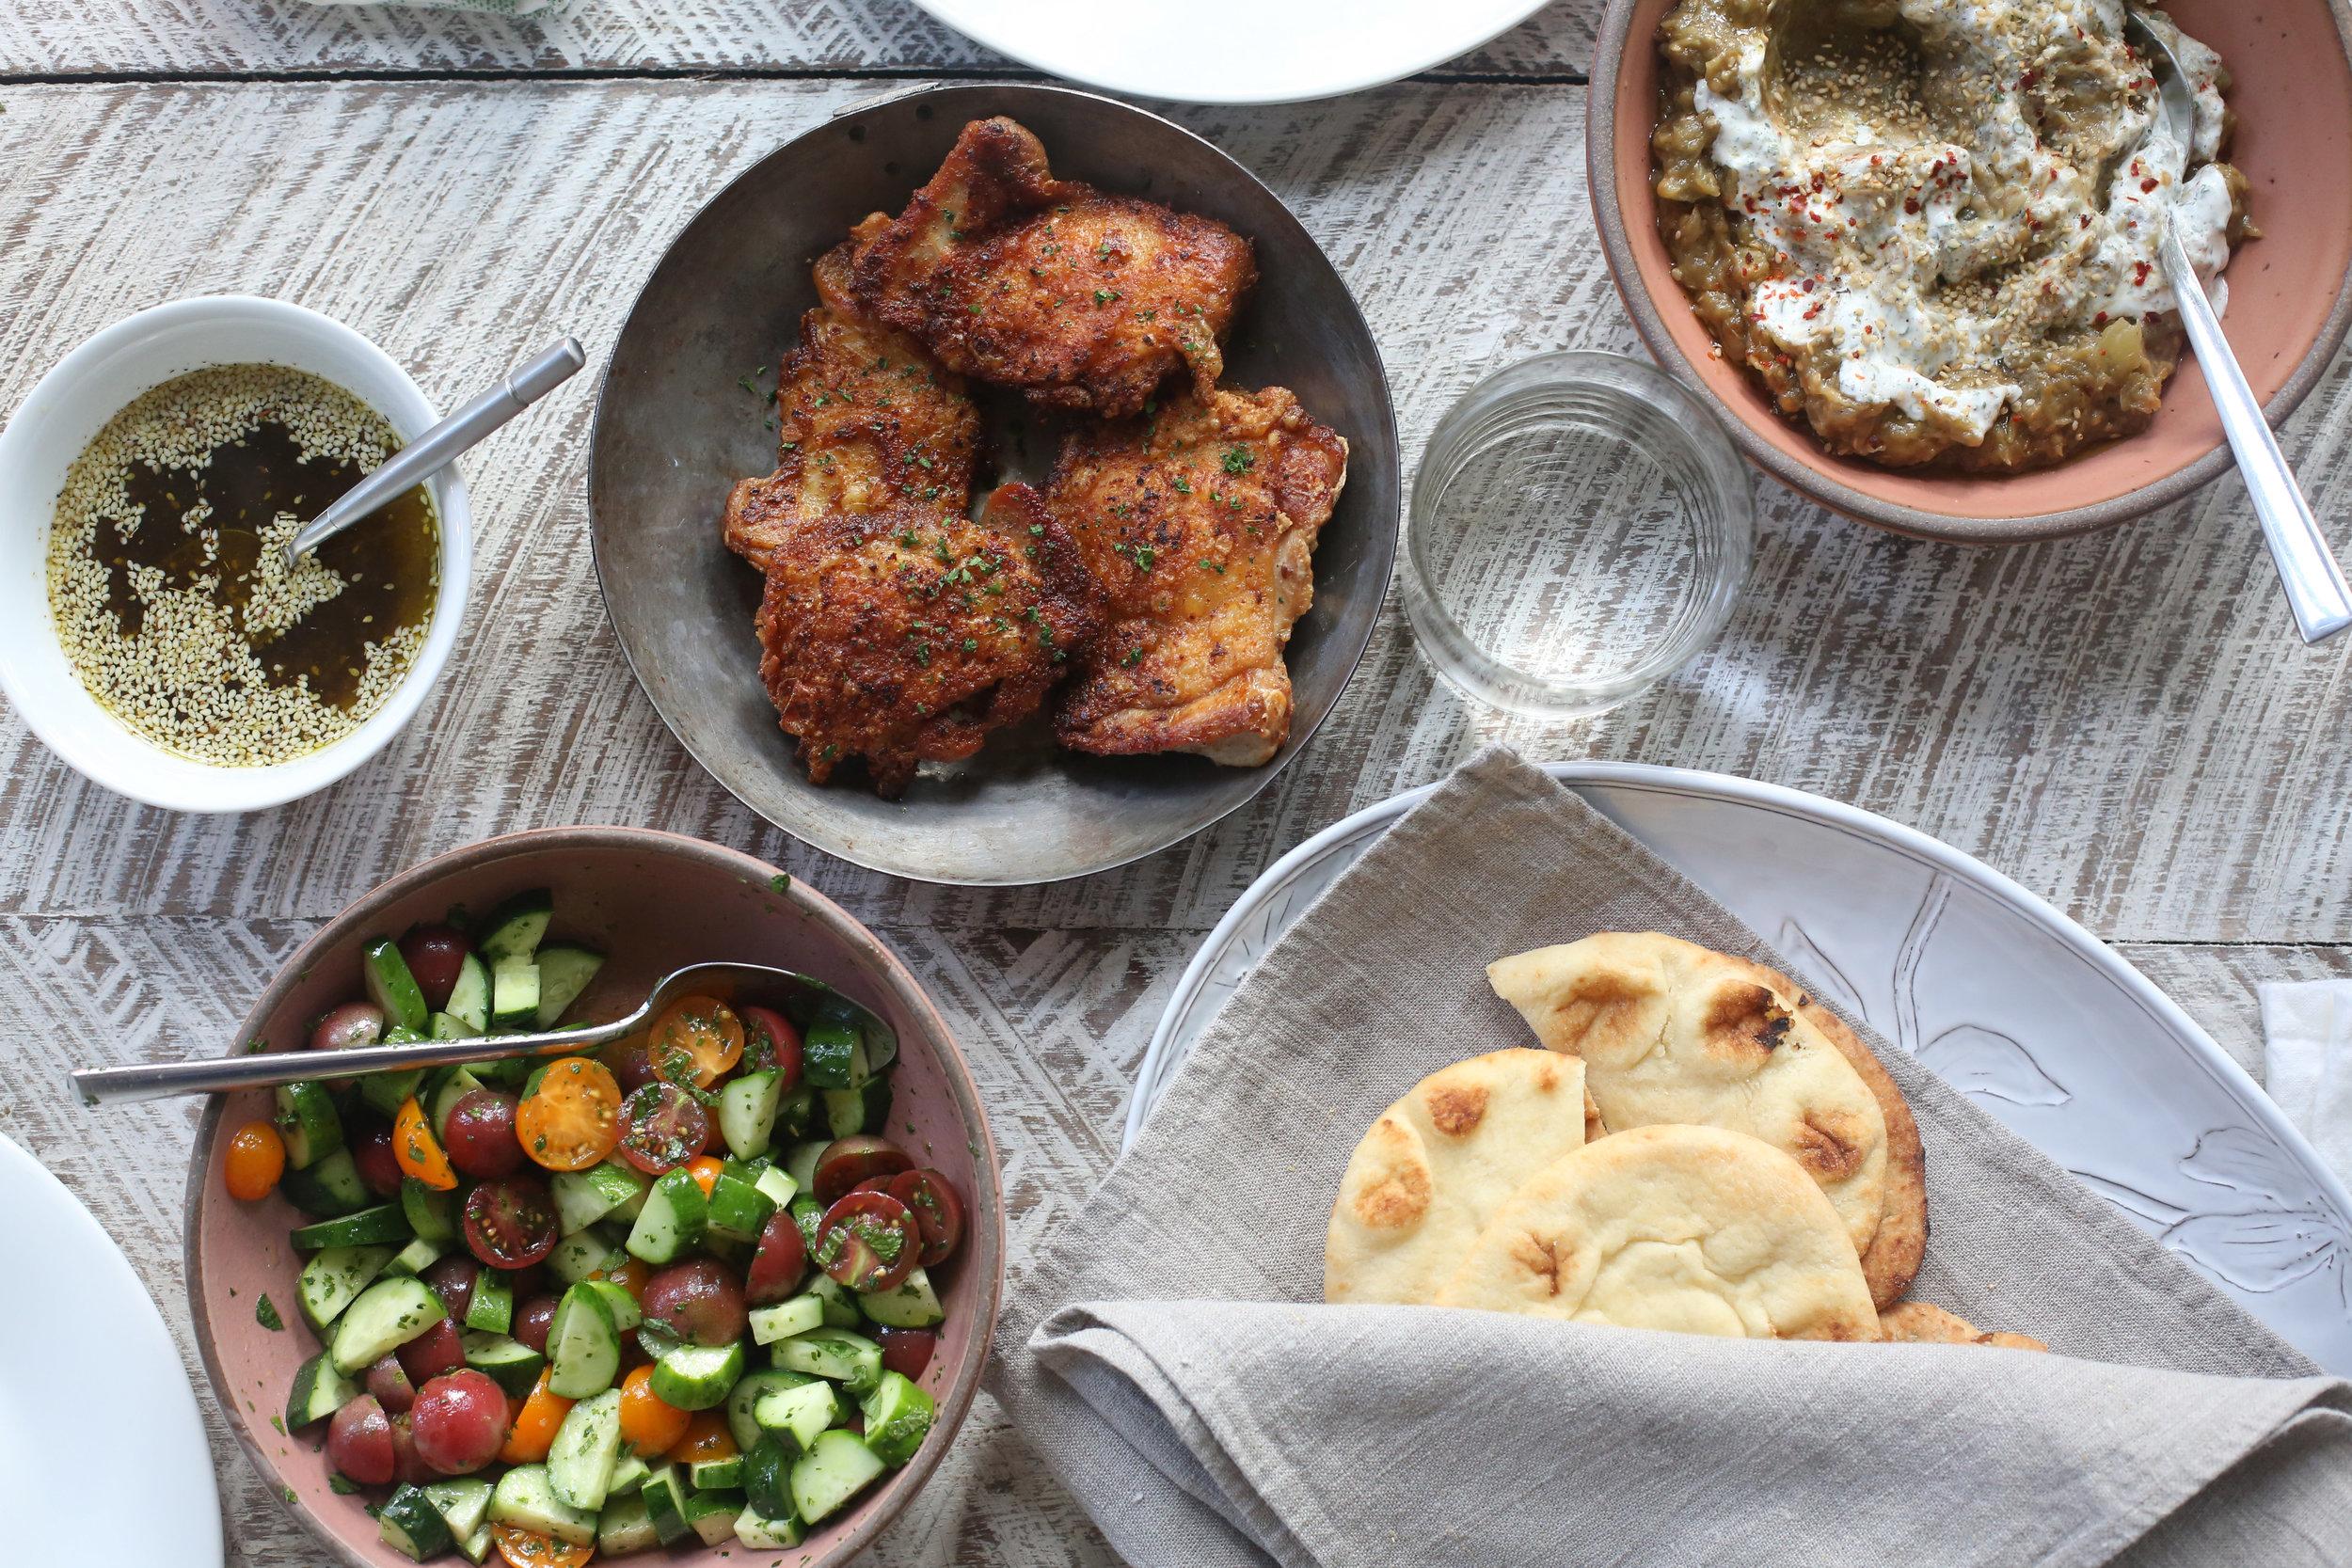 Food styling for Chef Whitney Otawka.